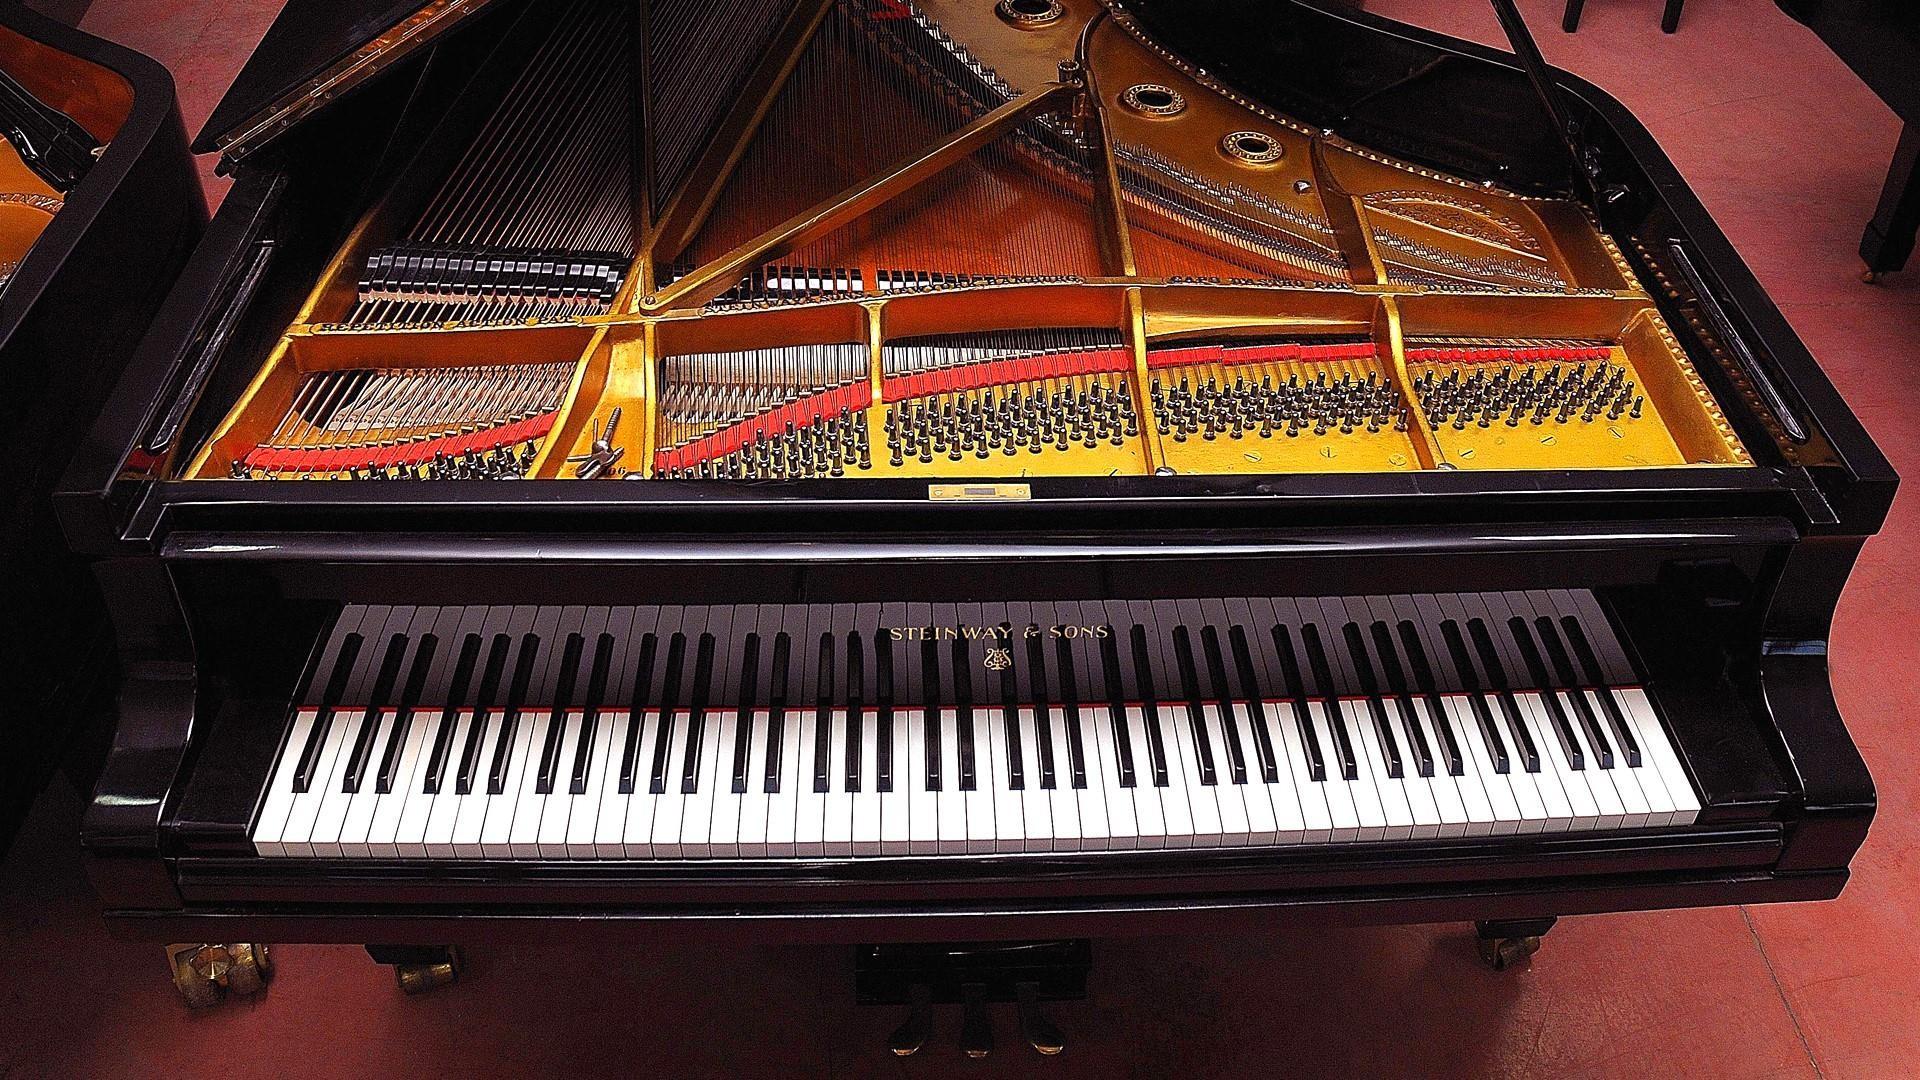 Hd Piano